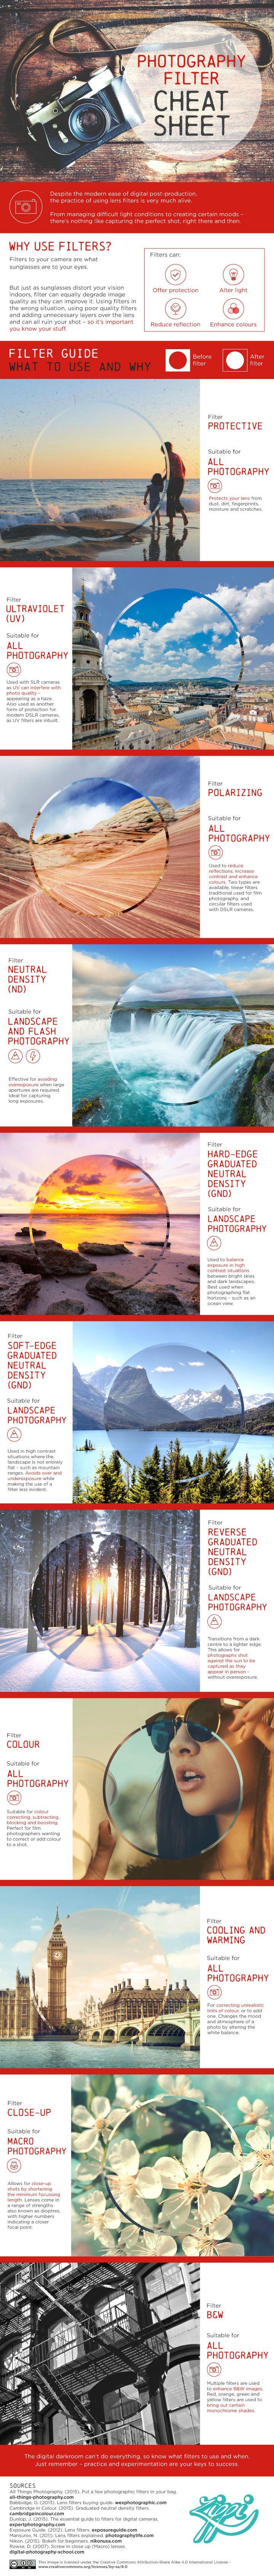 Photography Filter Cheat Sheet